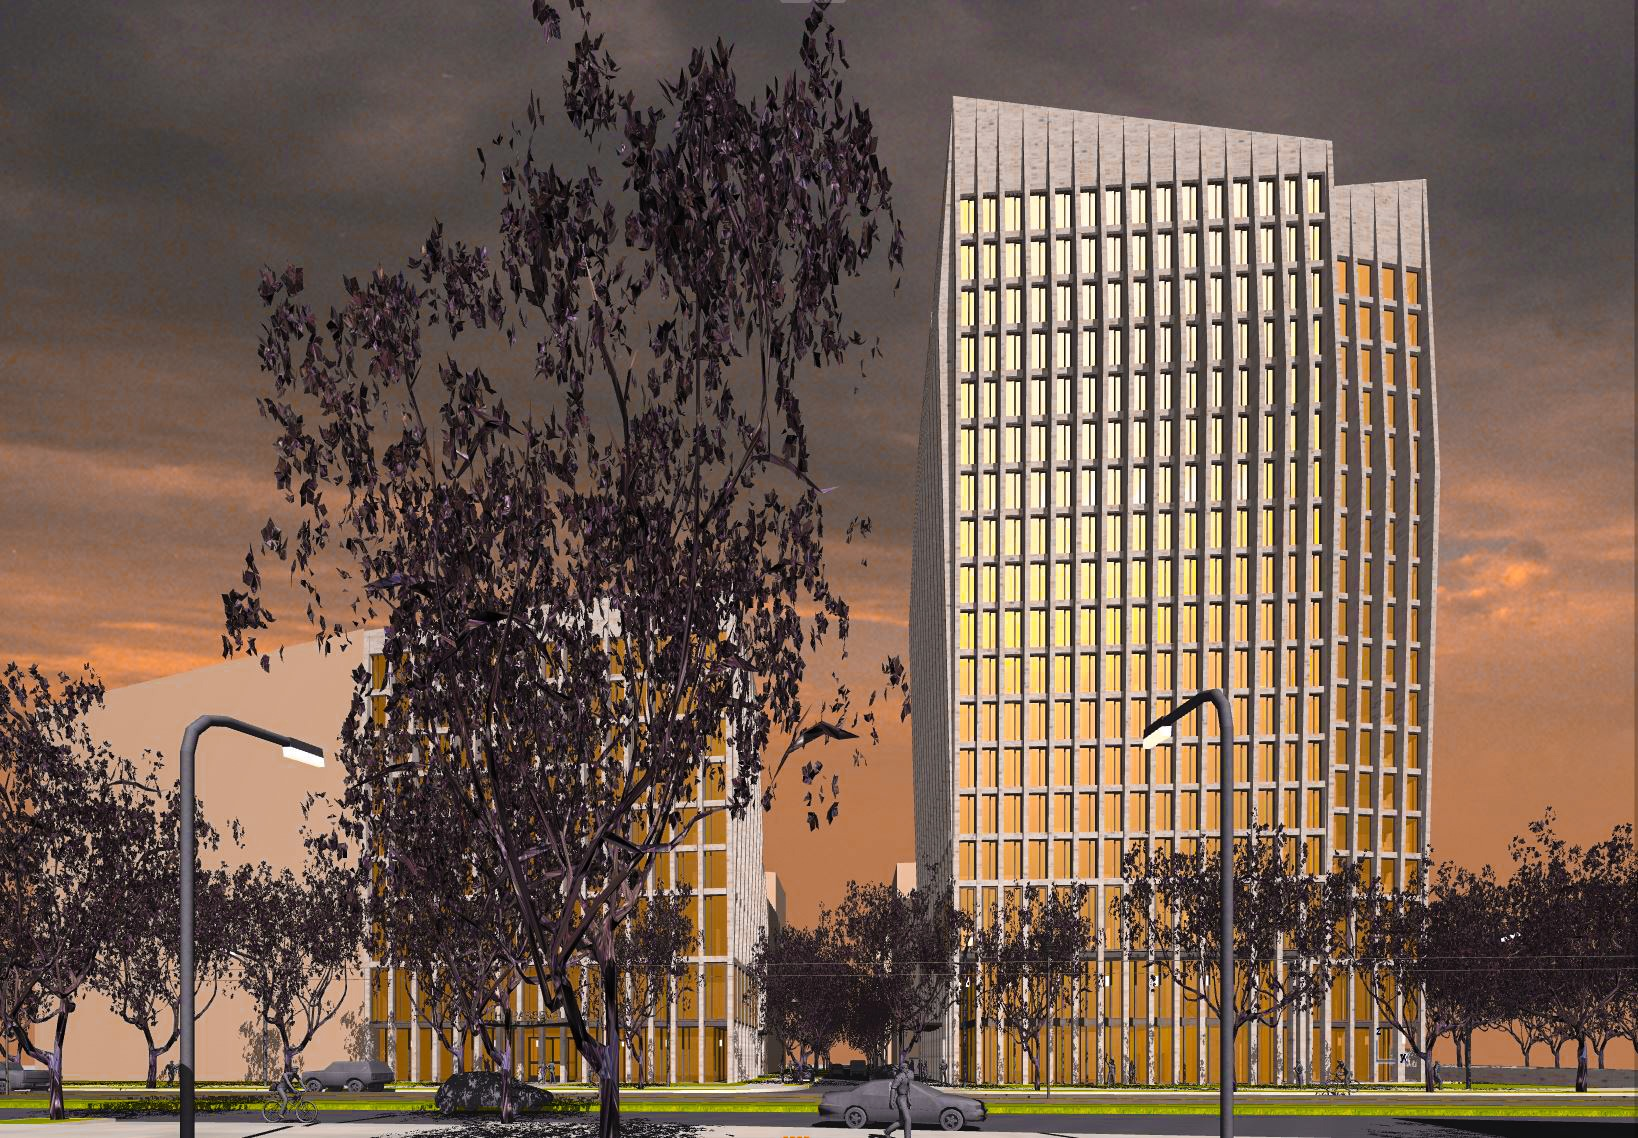 rebstockpark_projekt_sapphire_immobilien_investment_1.jpg